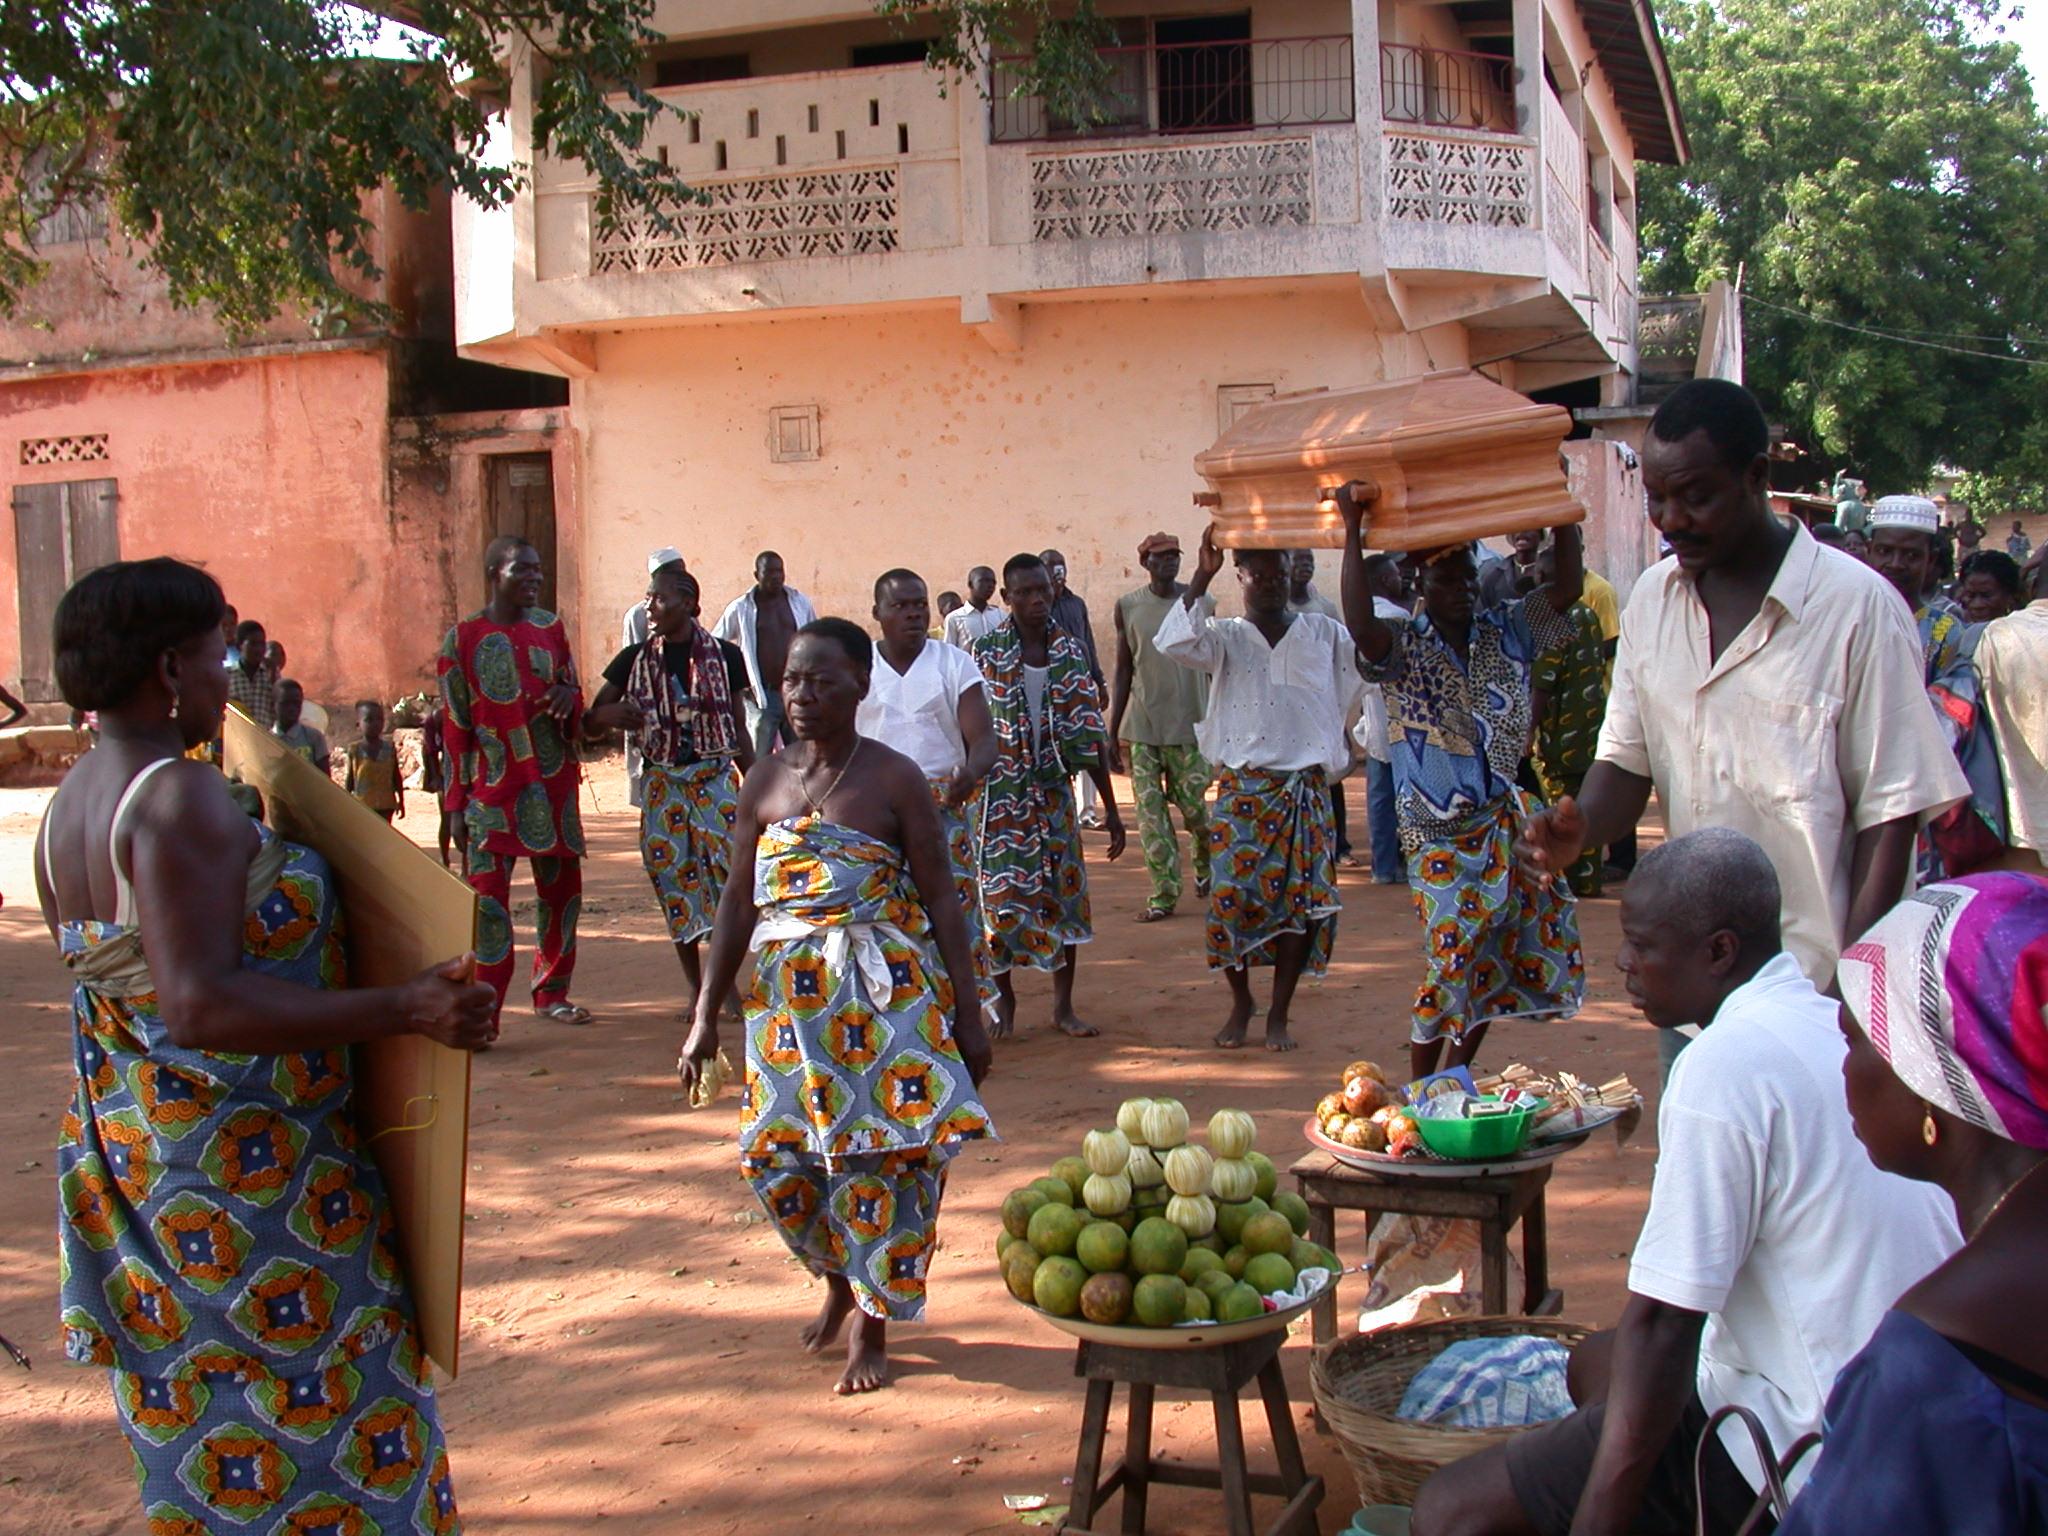 Funeral Procession, Ouidah, Benin